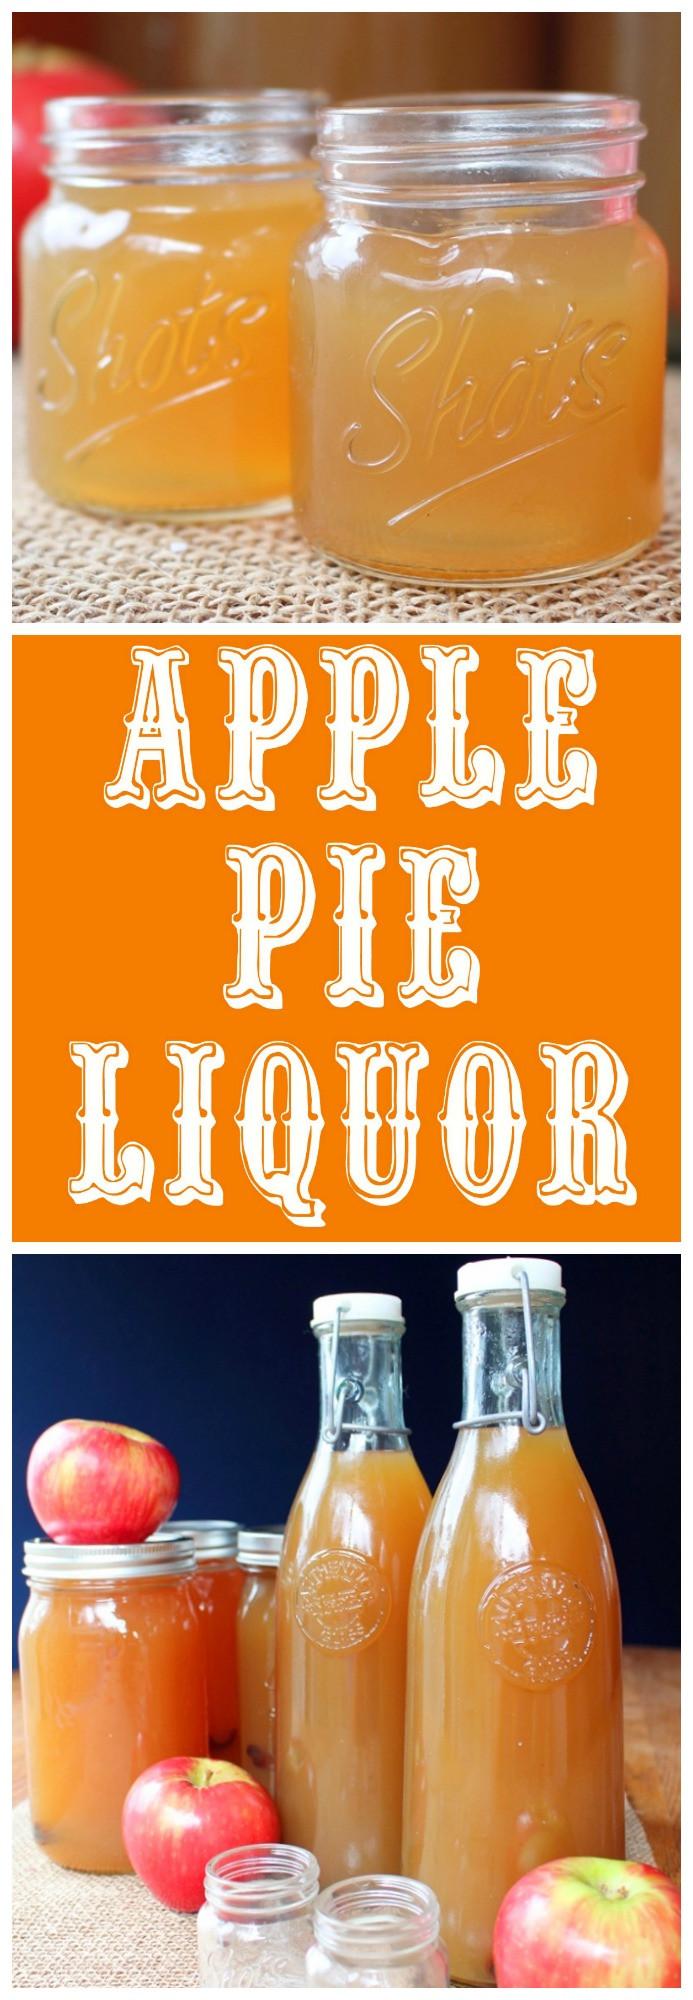 Apple Pie Liquor  apple pie liquor recipes